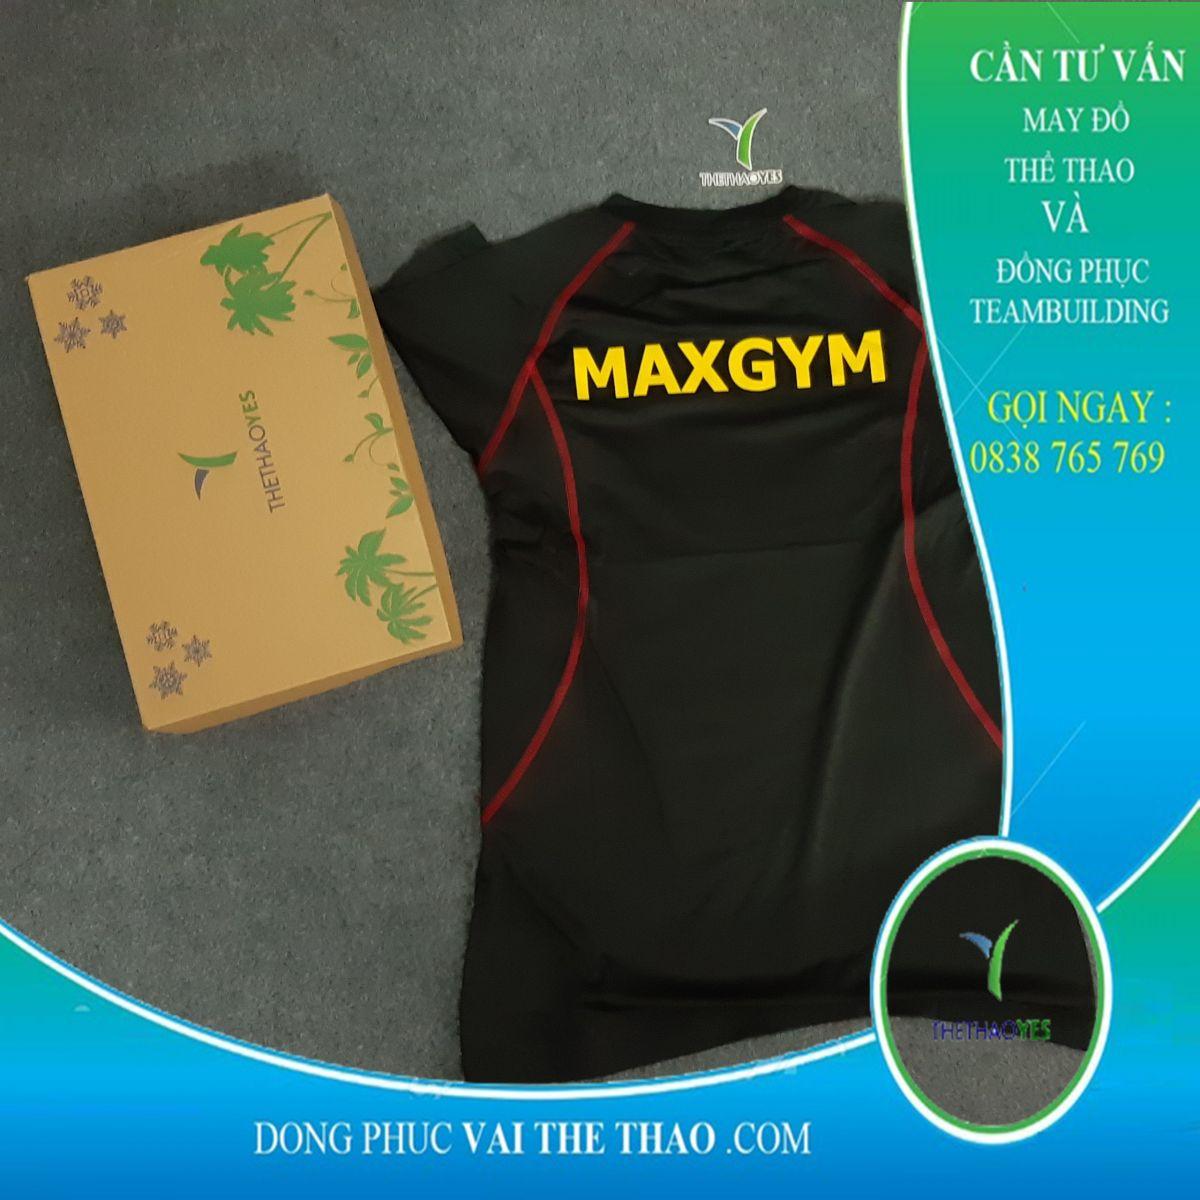 may áo thun tập gym